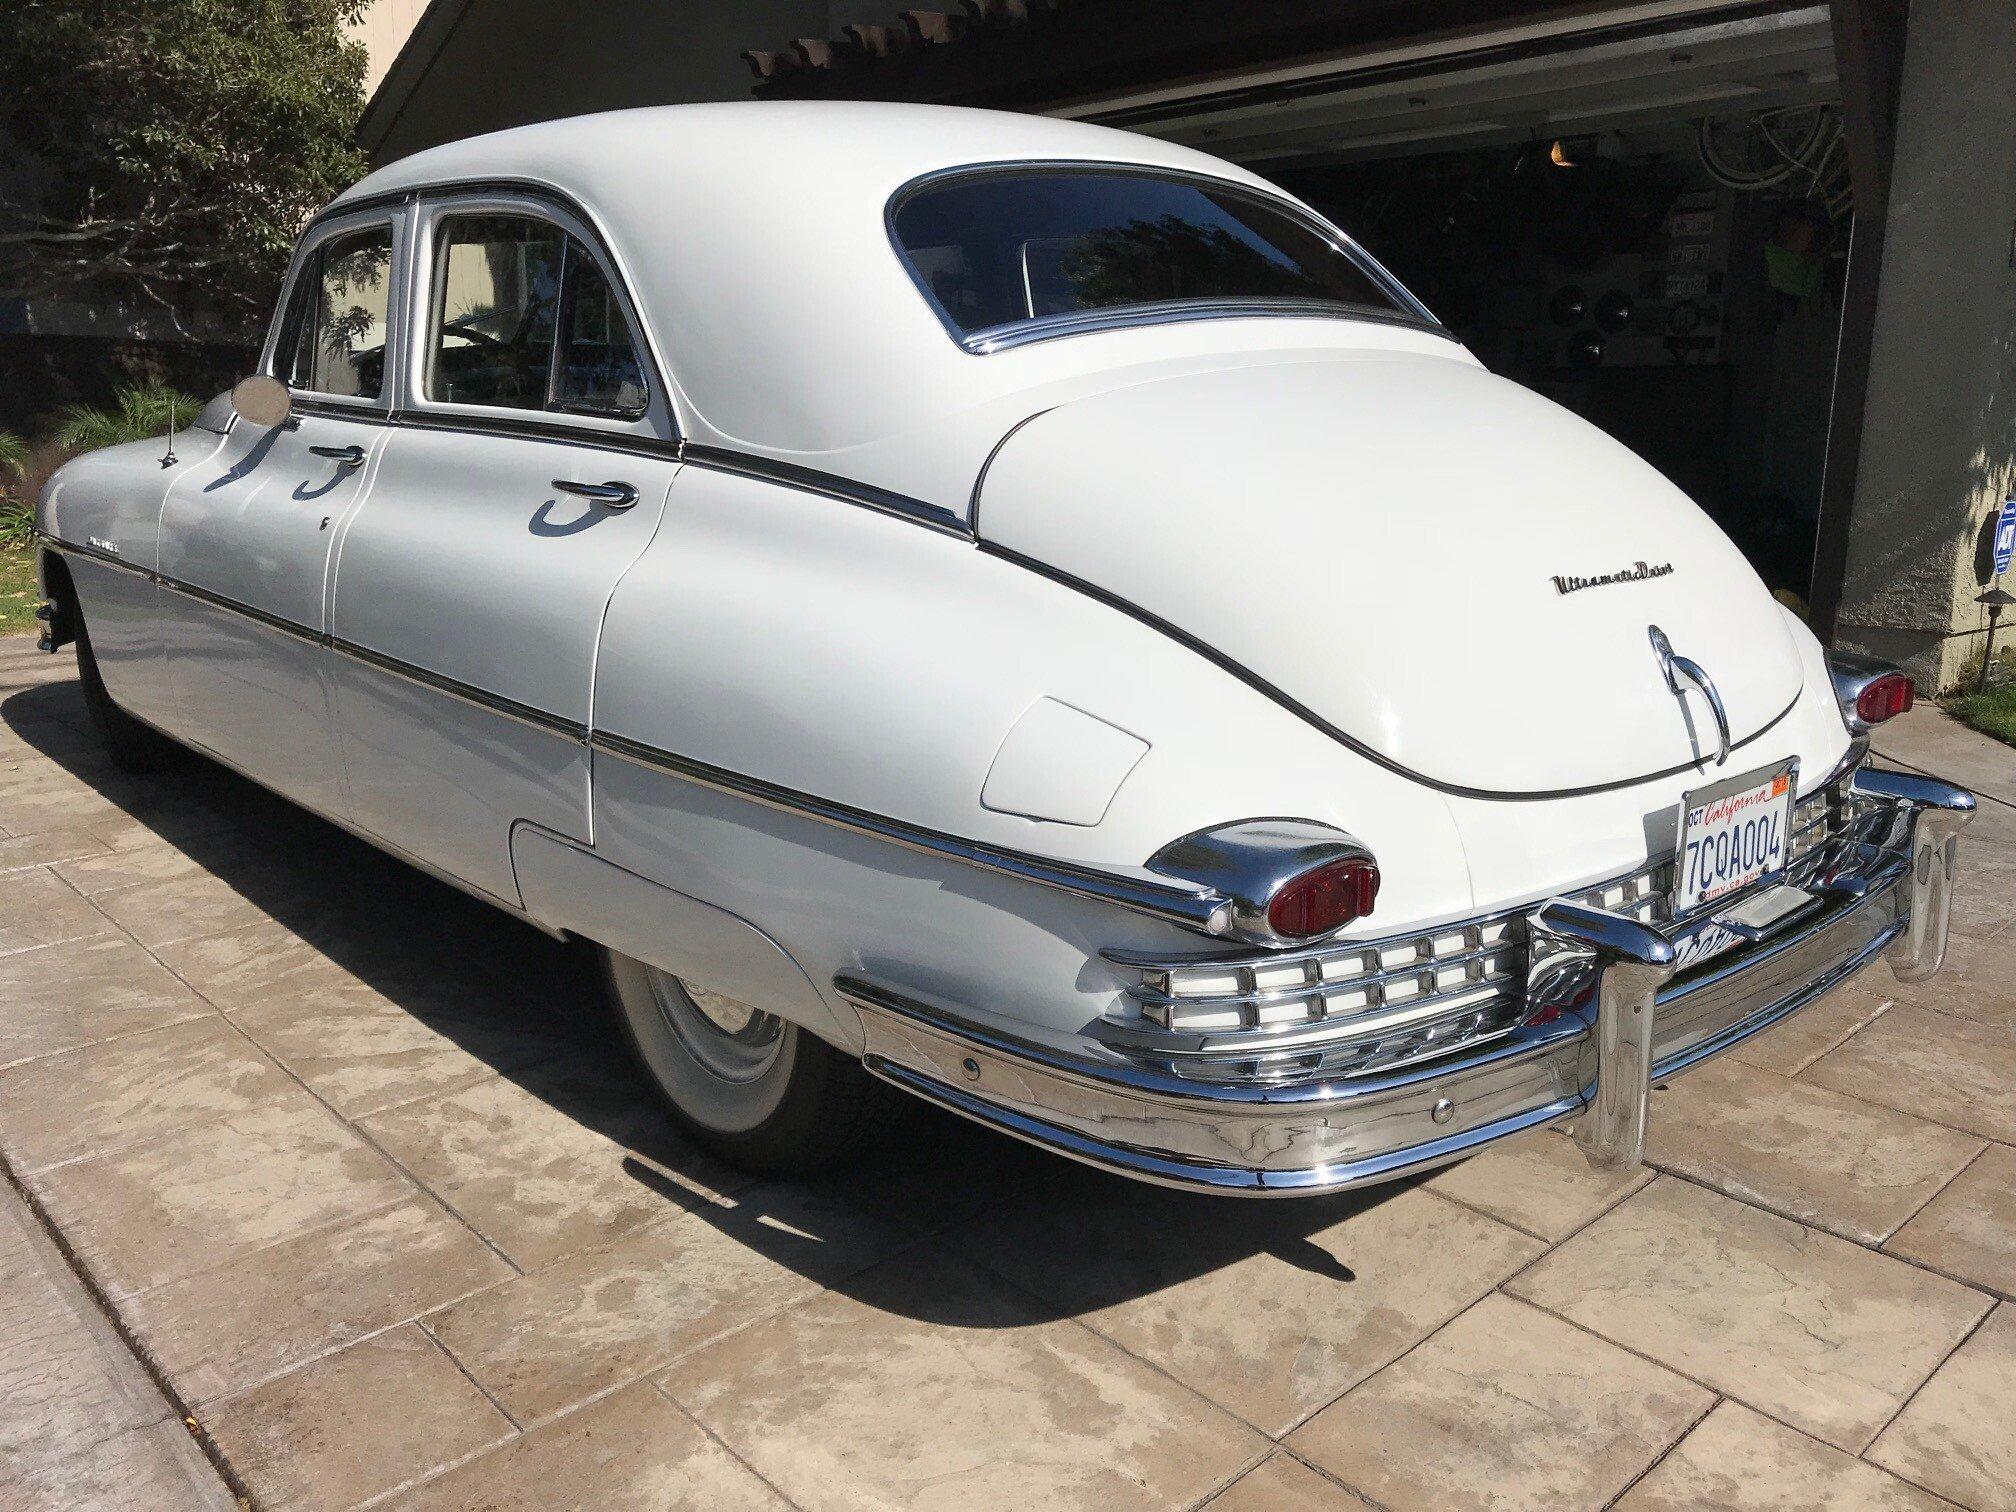 1950 Packard Wiring Harness - All Wiring Diagram Data on 2.5 car packard, supercharged packard,